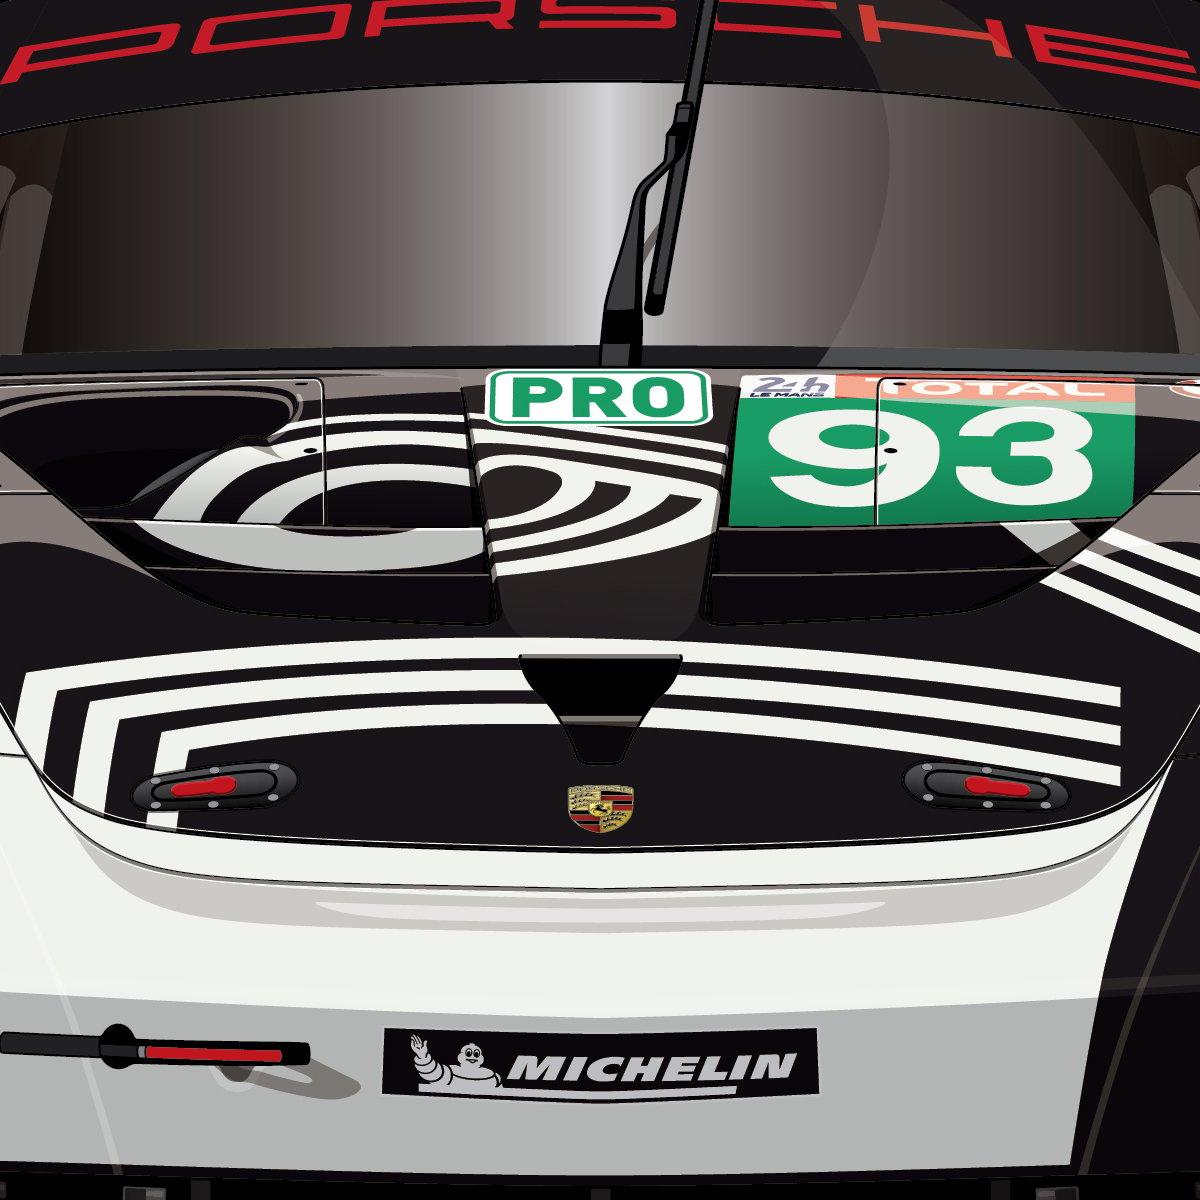 #93 Porsche RSR LeMans24Virtual (D1-118)